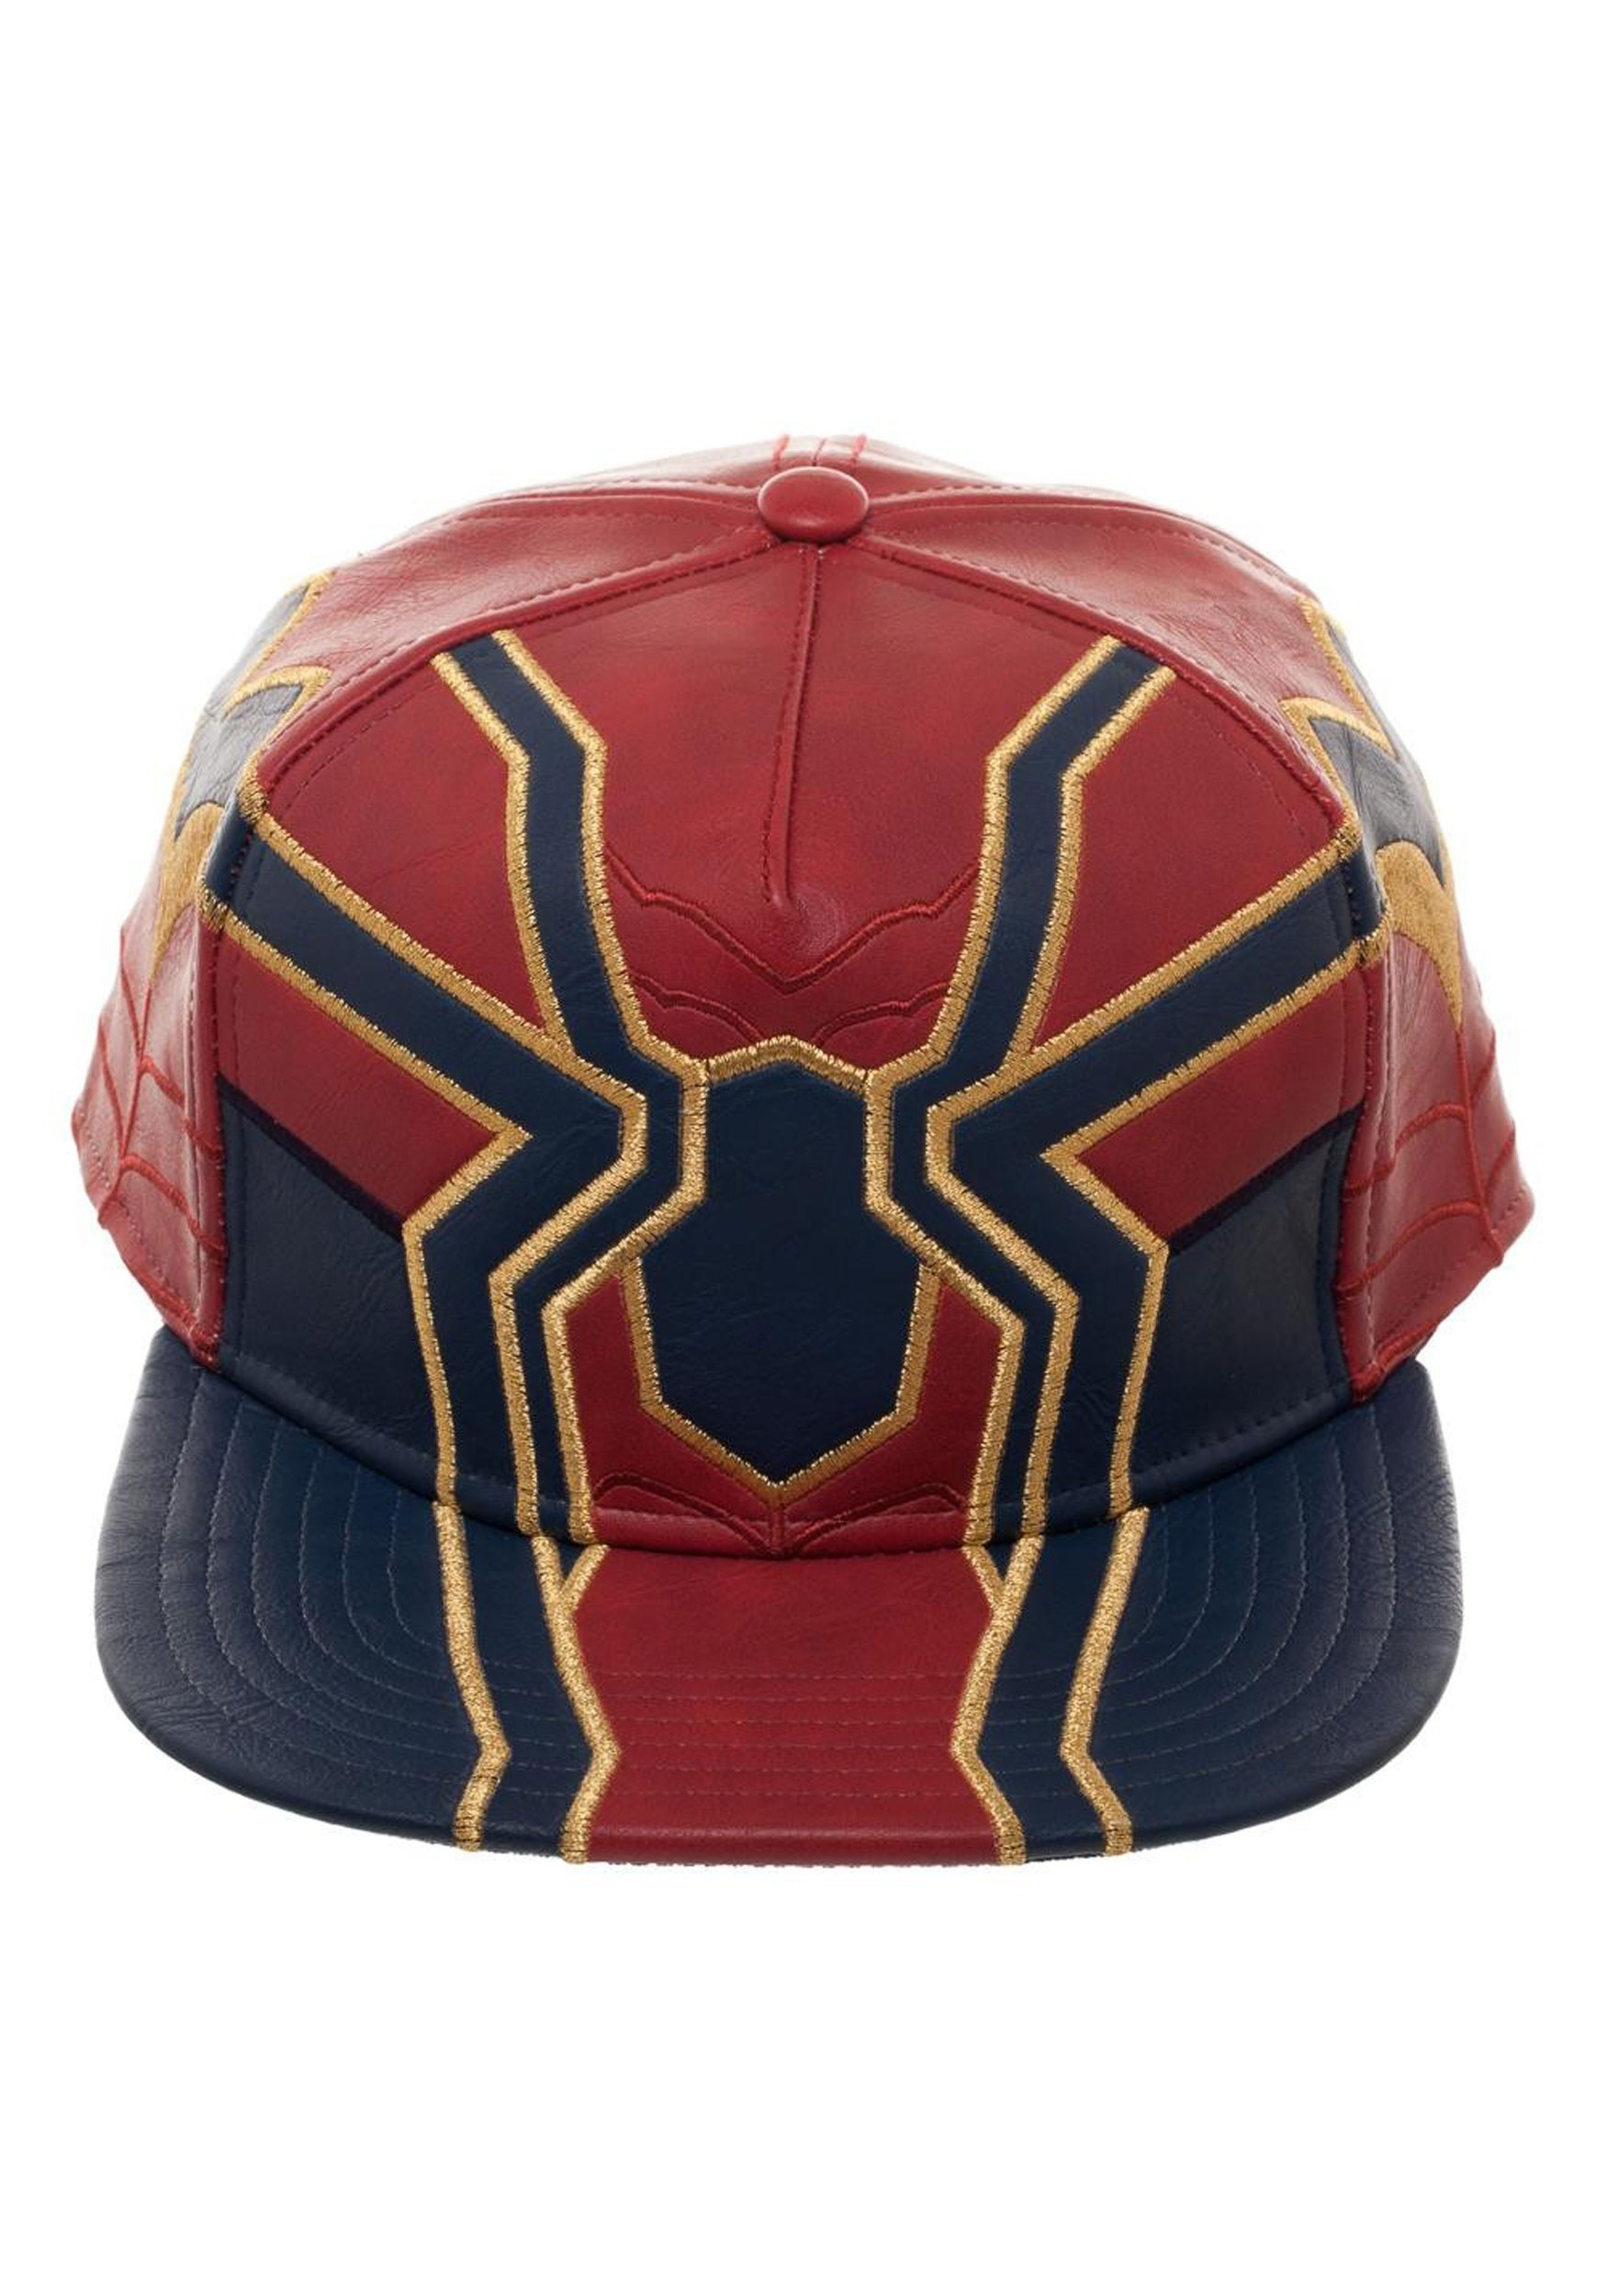 7aba36df Avengers Infinity War Iron Spider Suit Up PU Snapback Cap